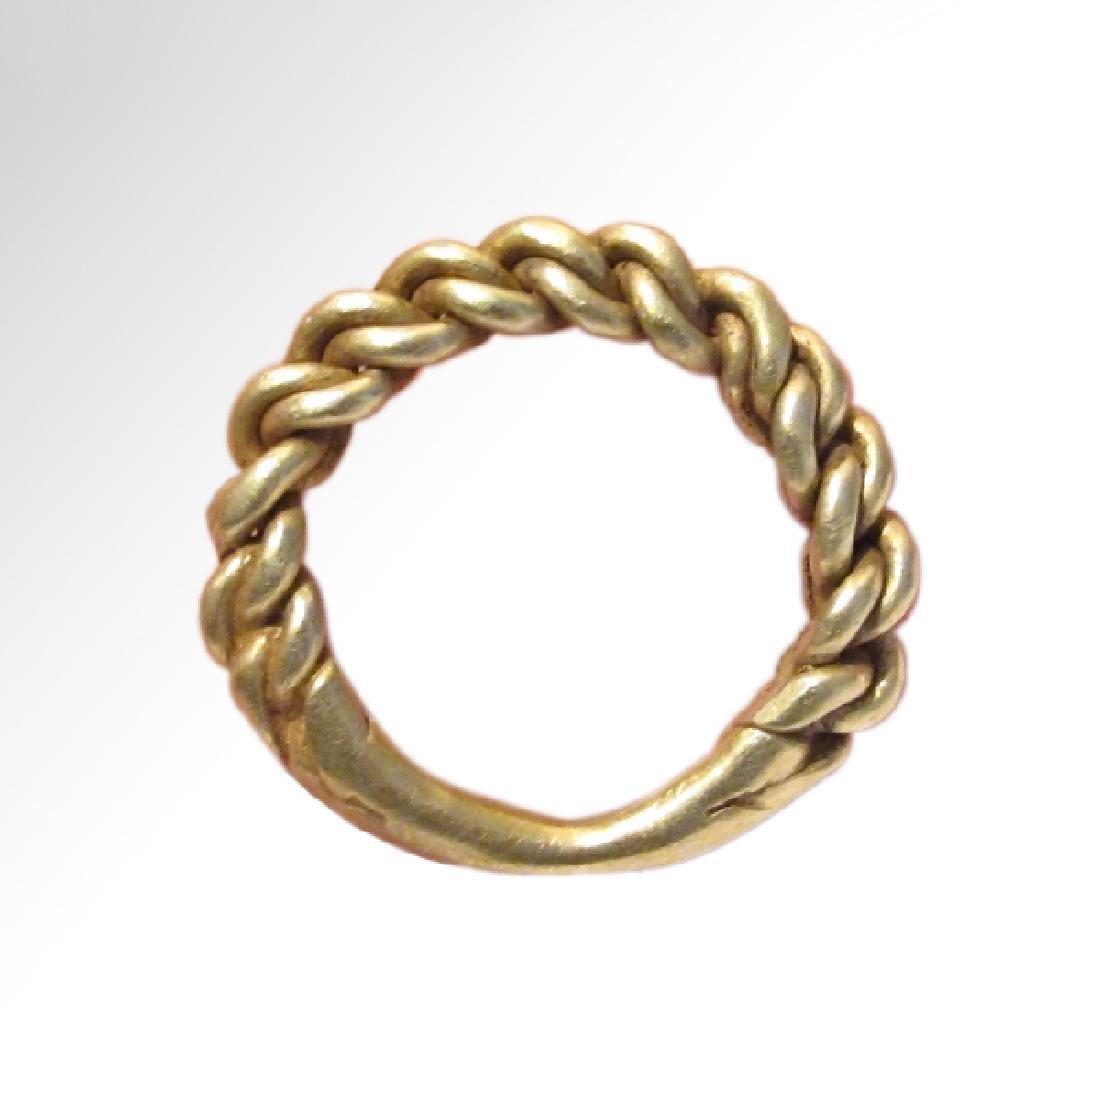 Viking Gold Ring, c. 10th Century A.D.